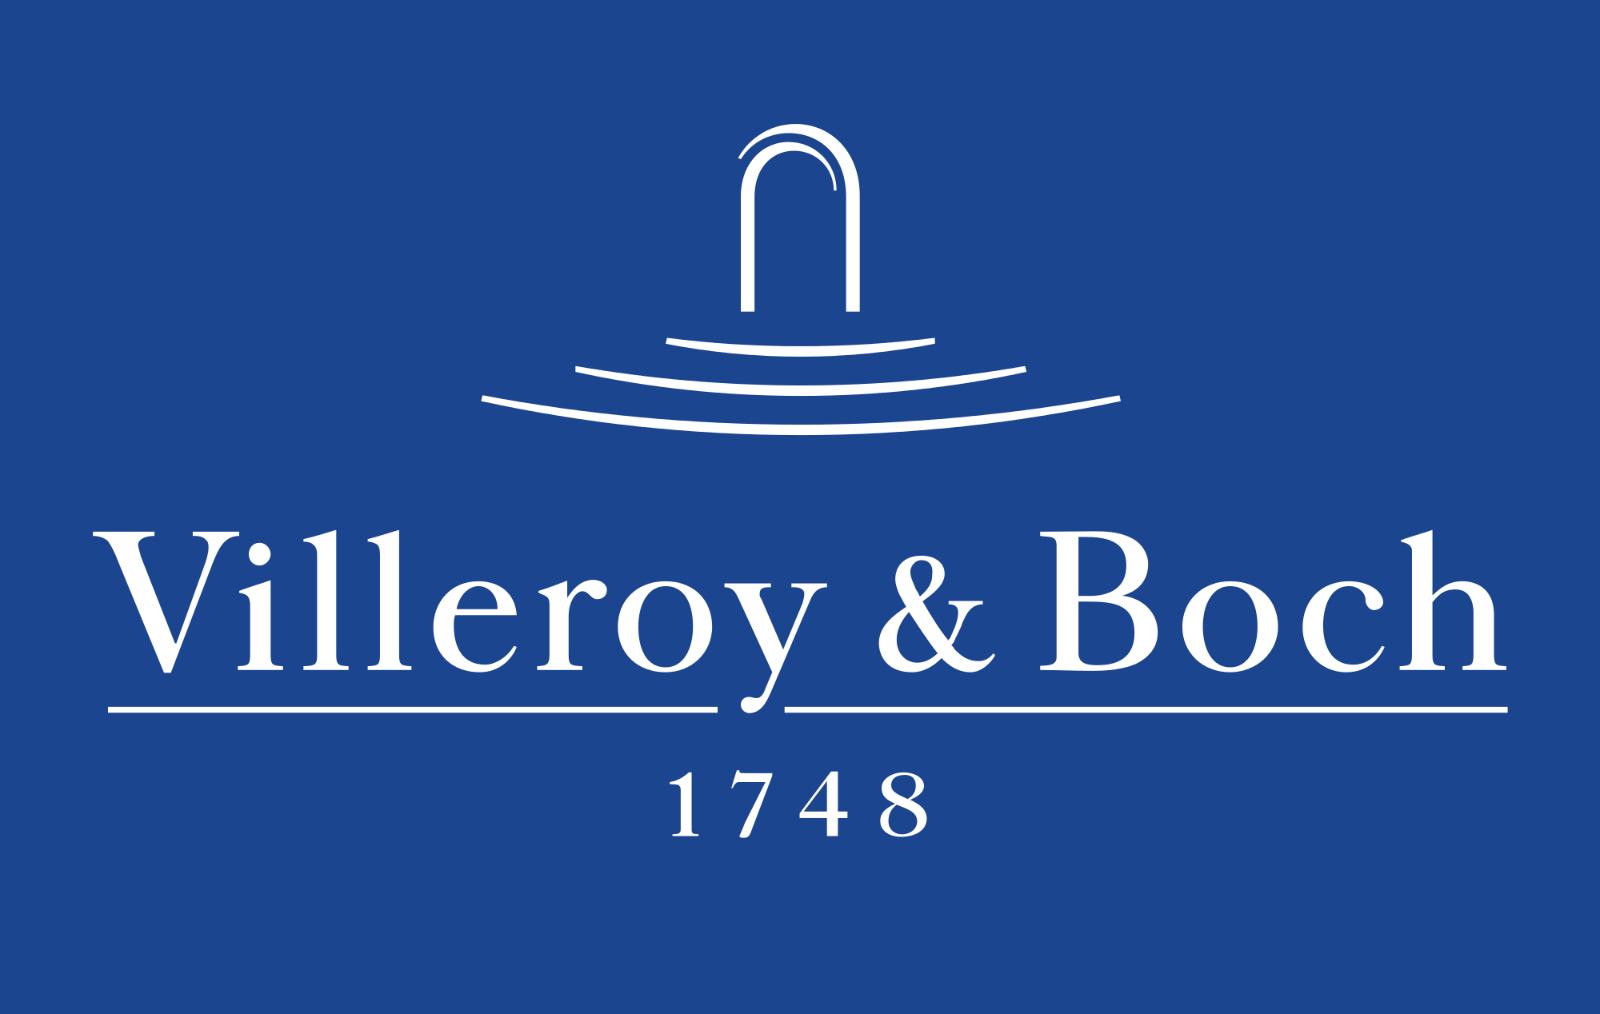 Villeroy & Boch Boch Boch - Flow - Set Piatti 18 pezzi per 6 persone - Rivenditore 42af85